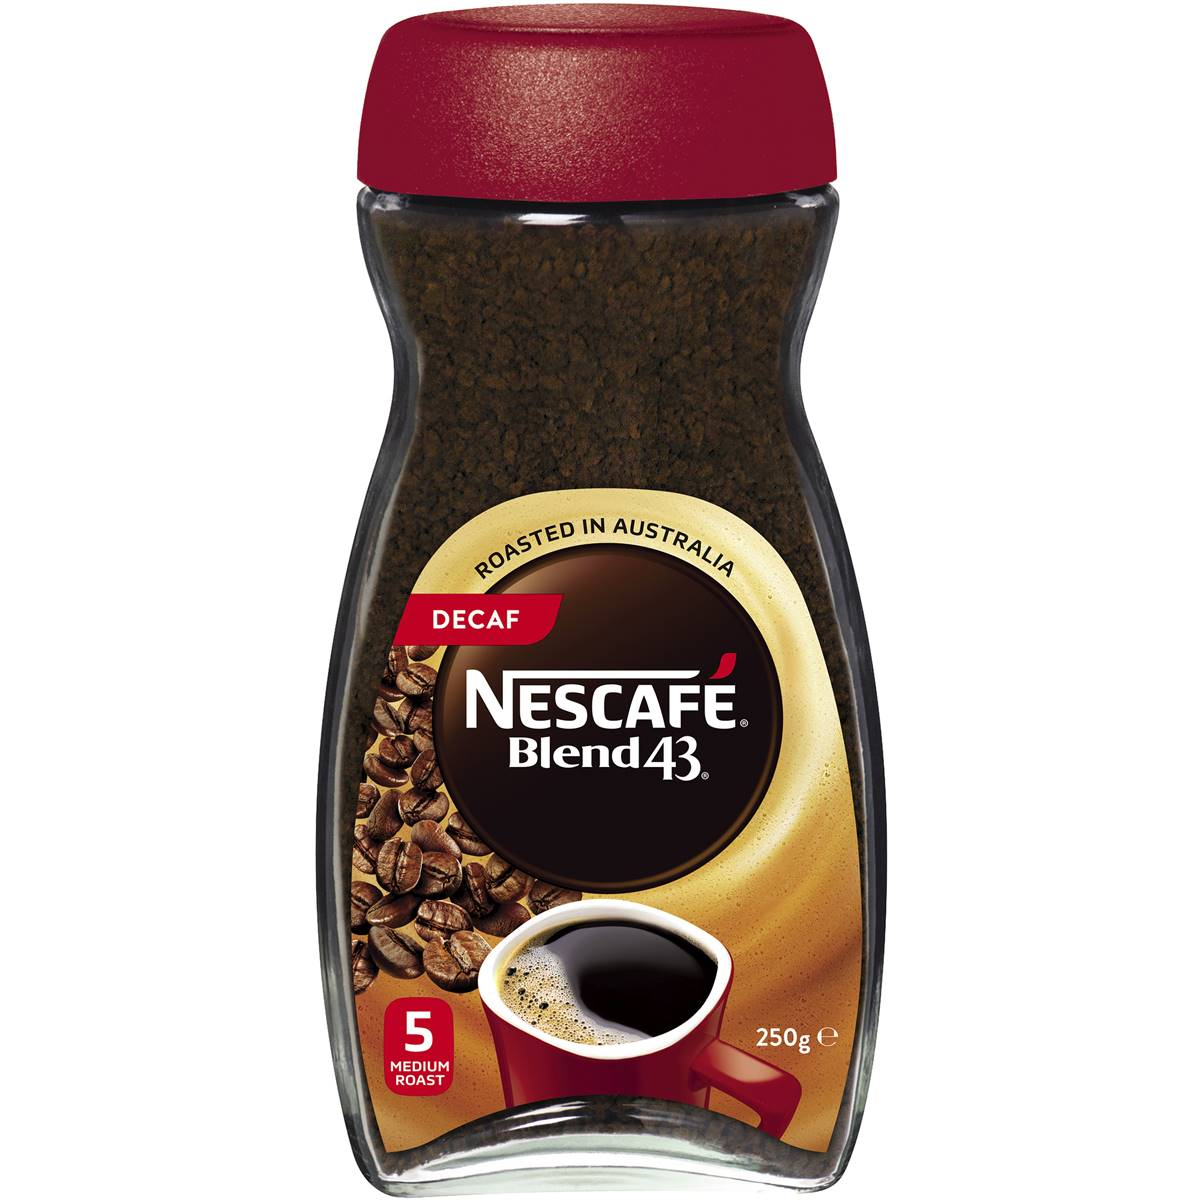 Nescafe Blend 43 Decaffeinated Instant Coffee